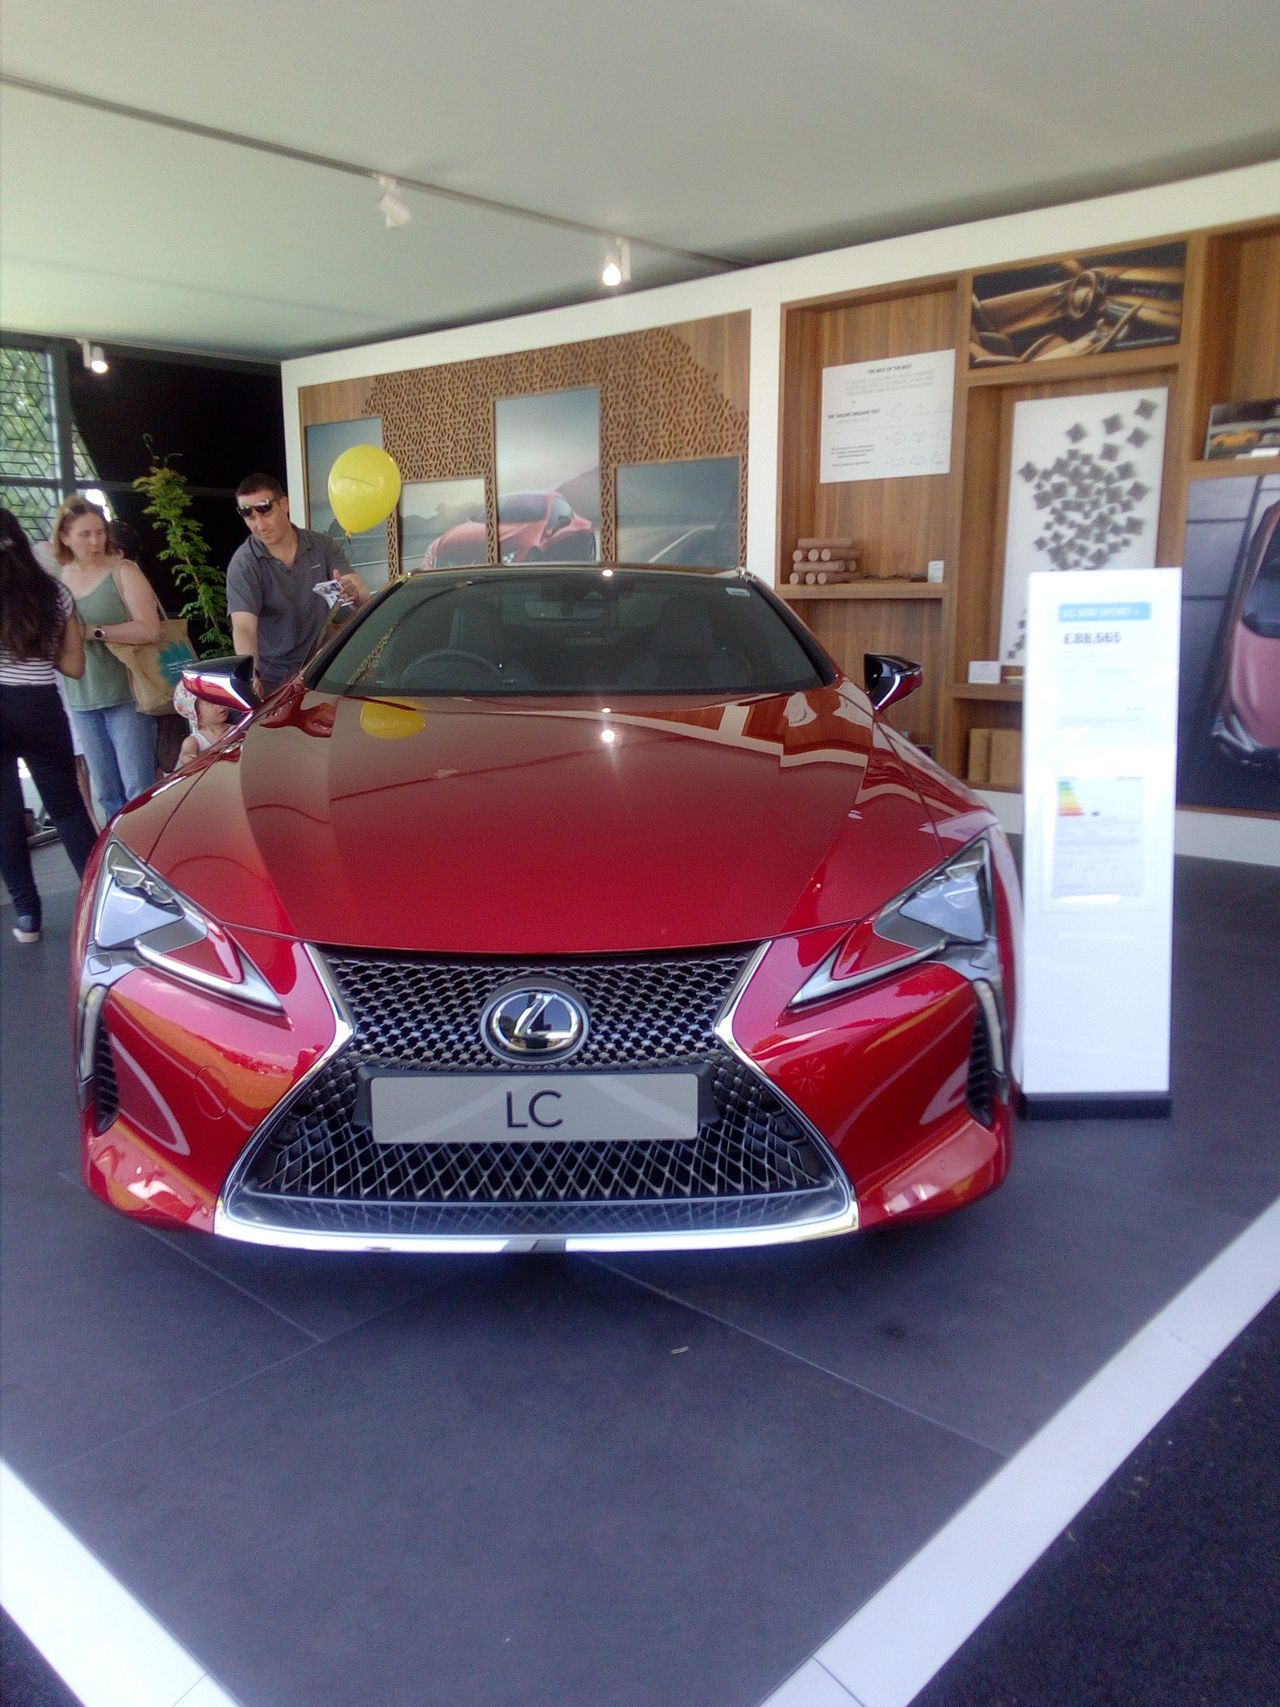 Luxury Hospitality and Lexus